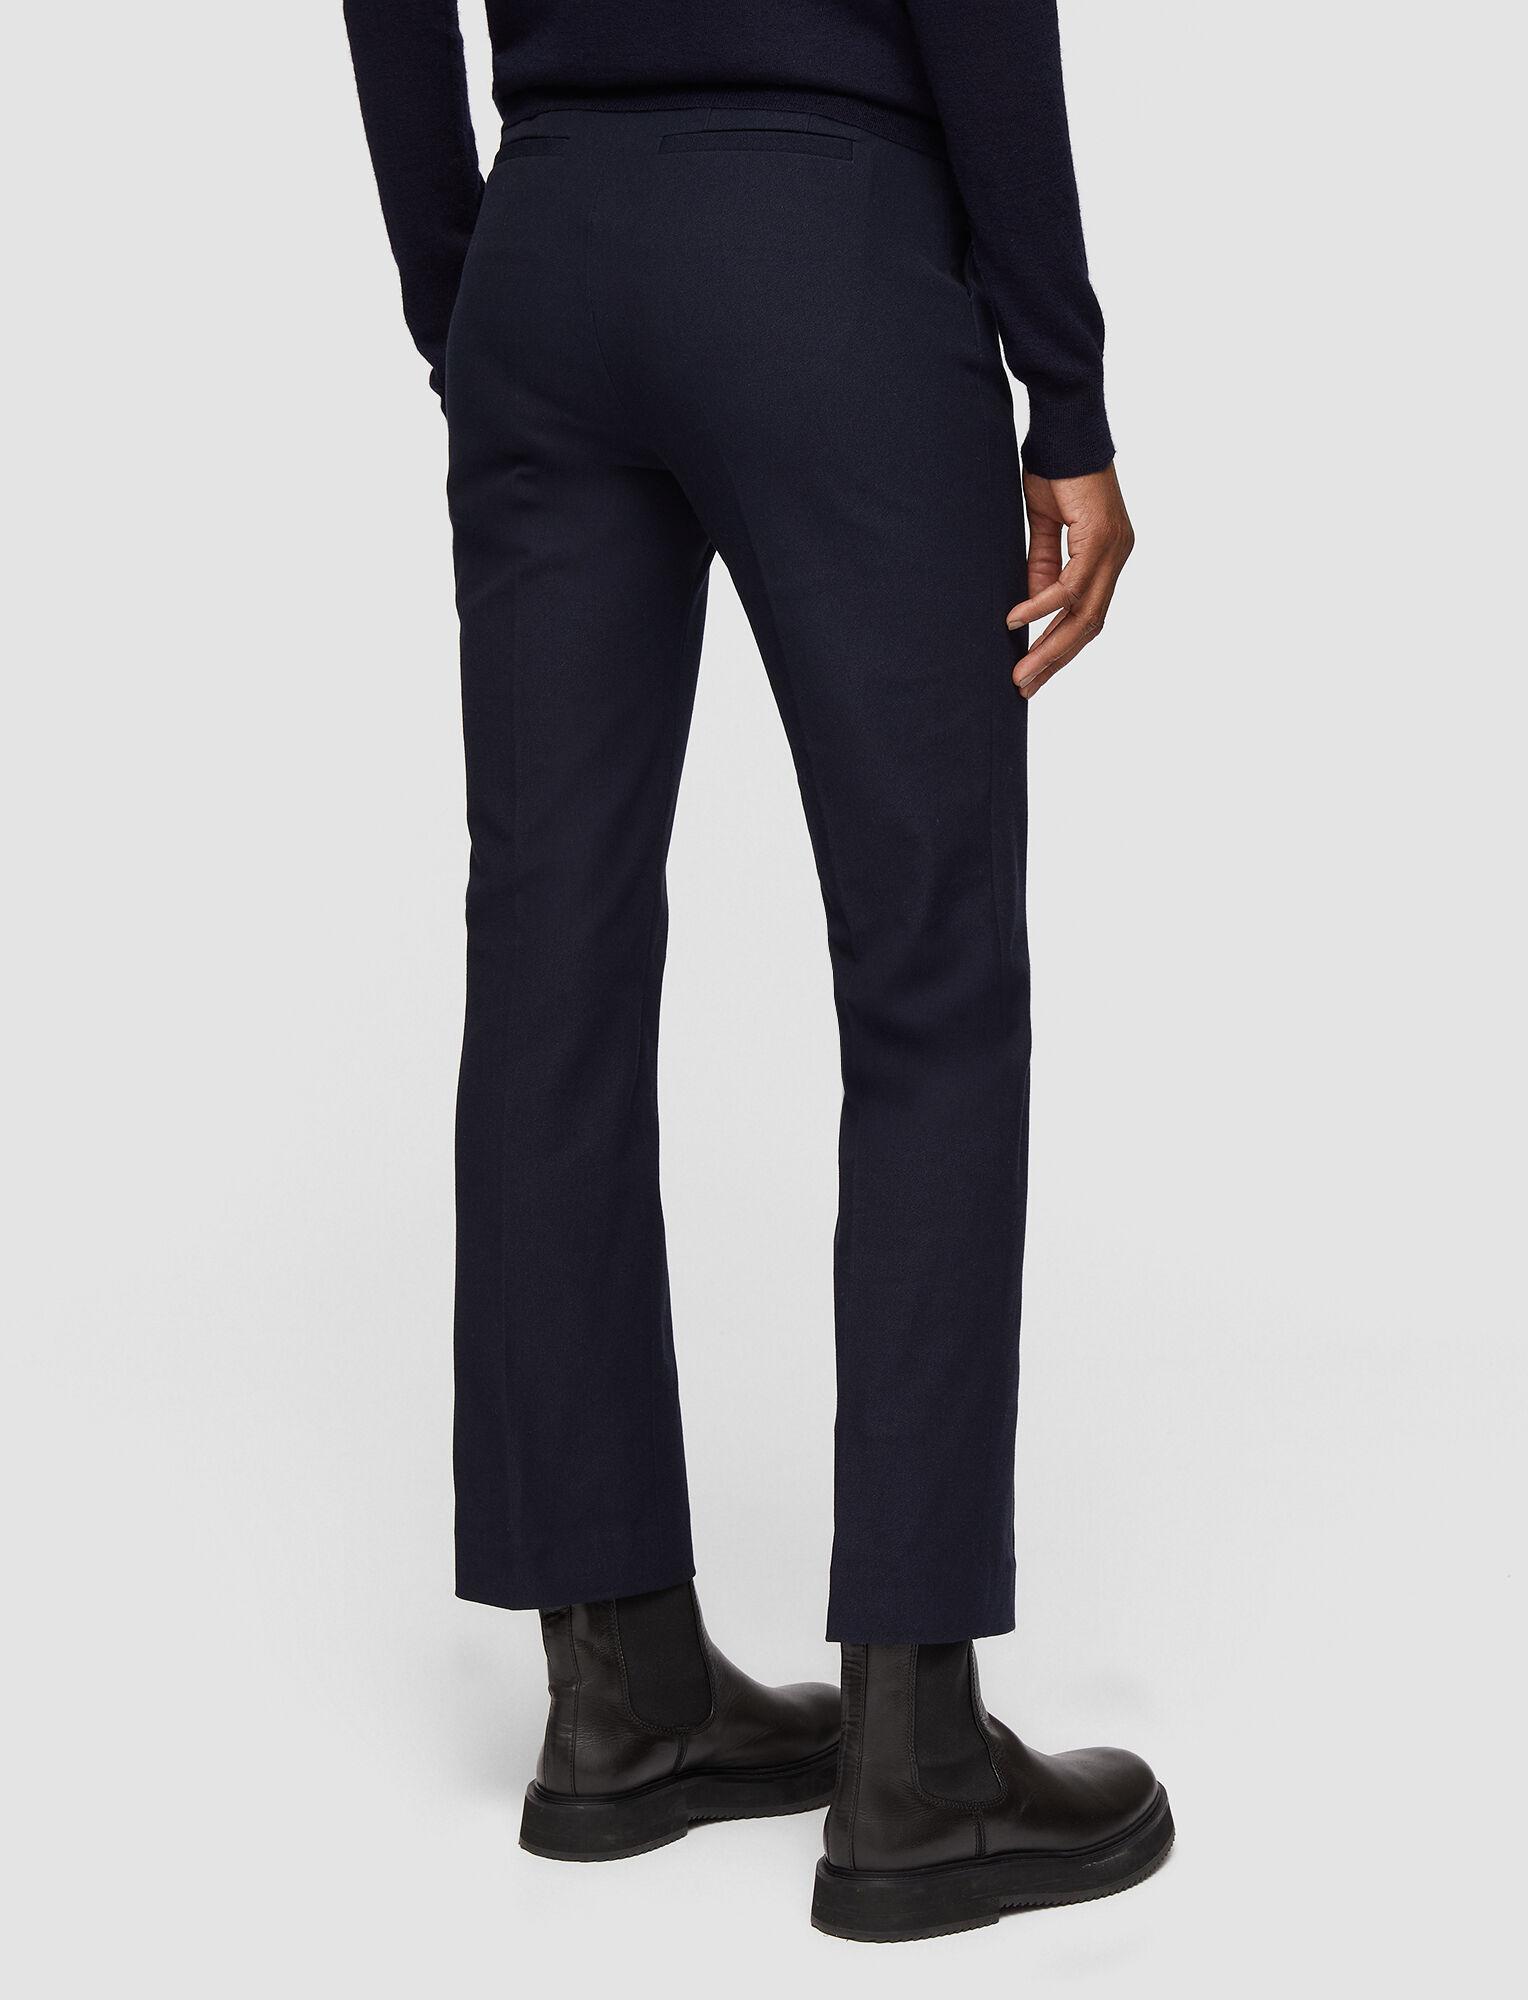 Joseph, Coleman Gabardine Stretch Trousers, in NAVY